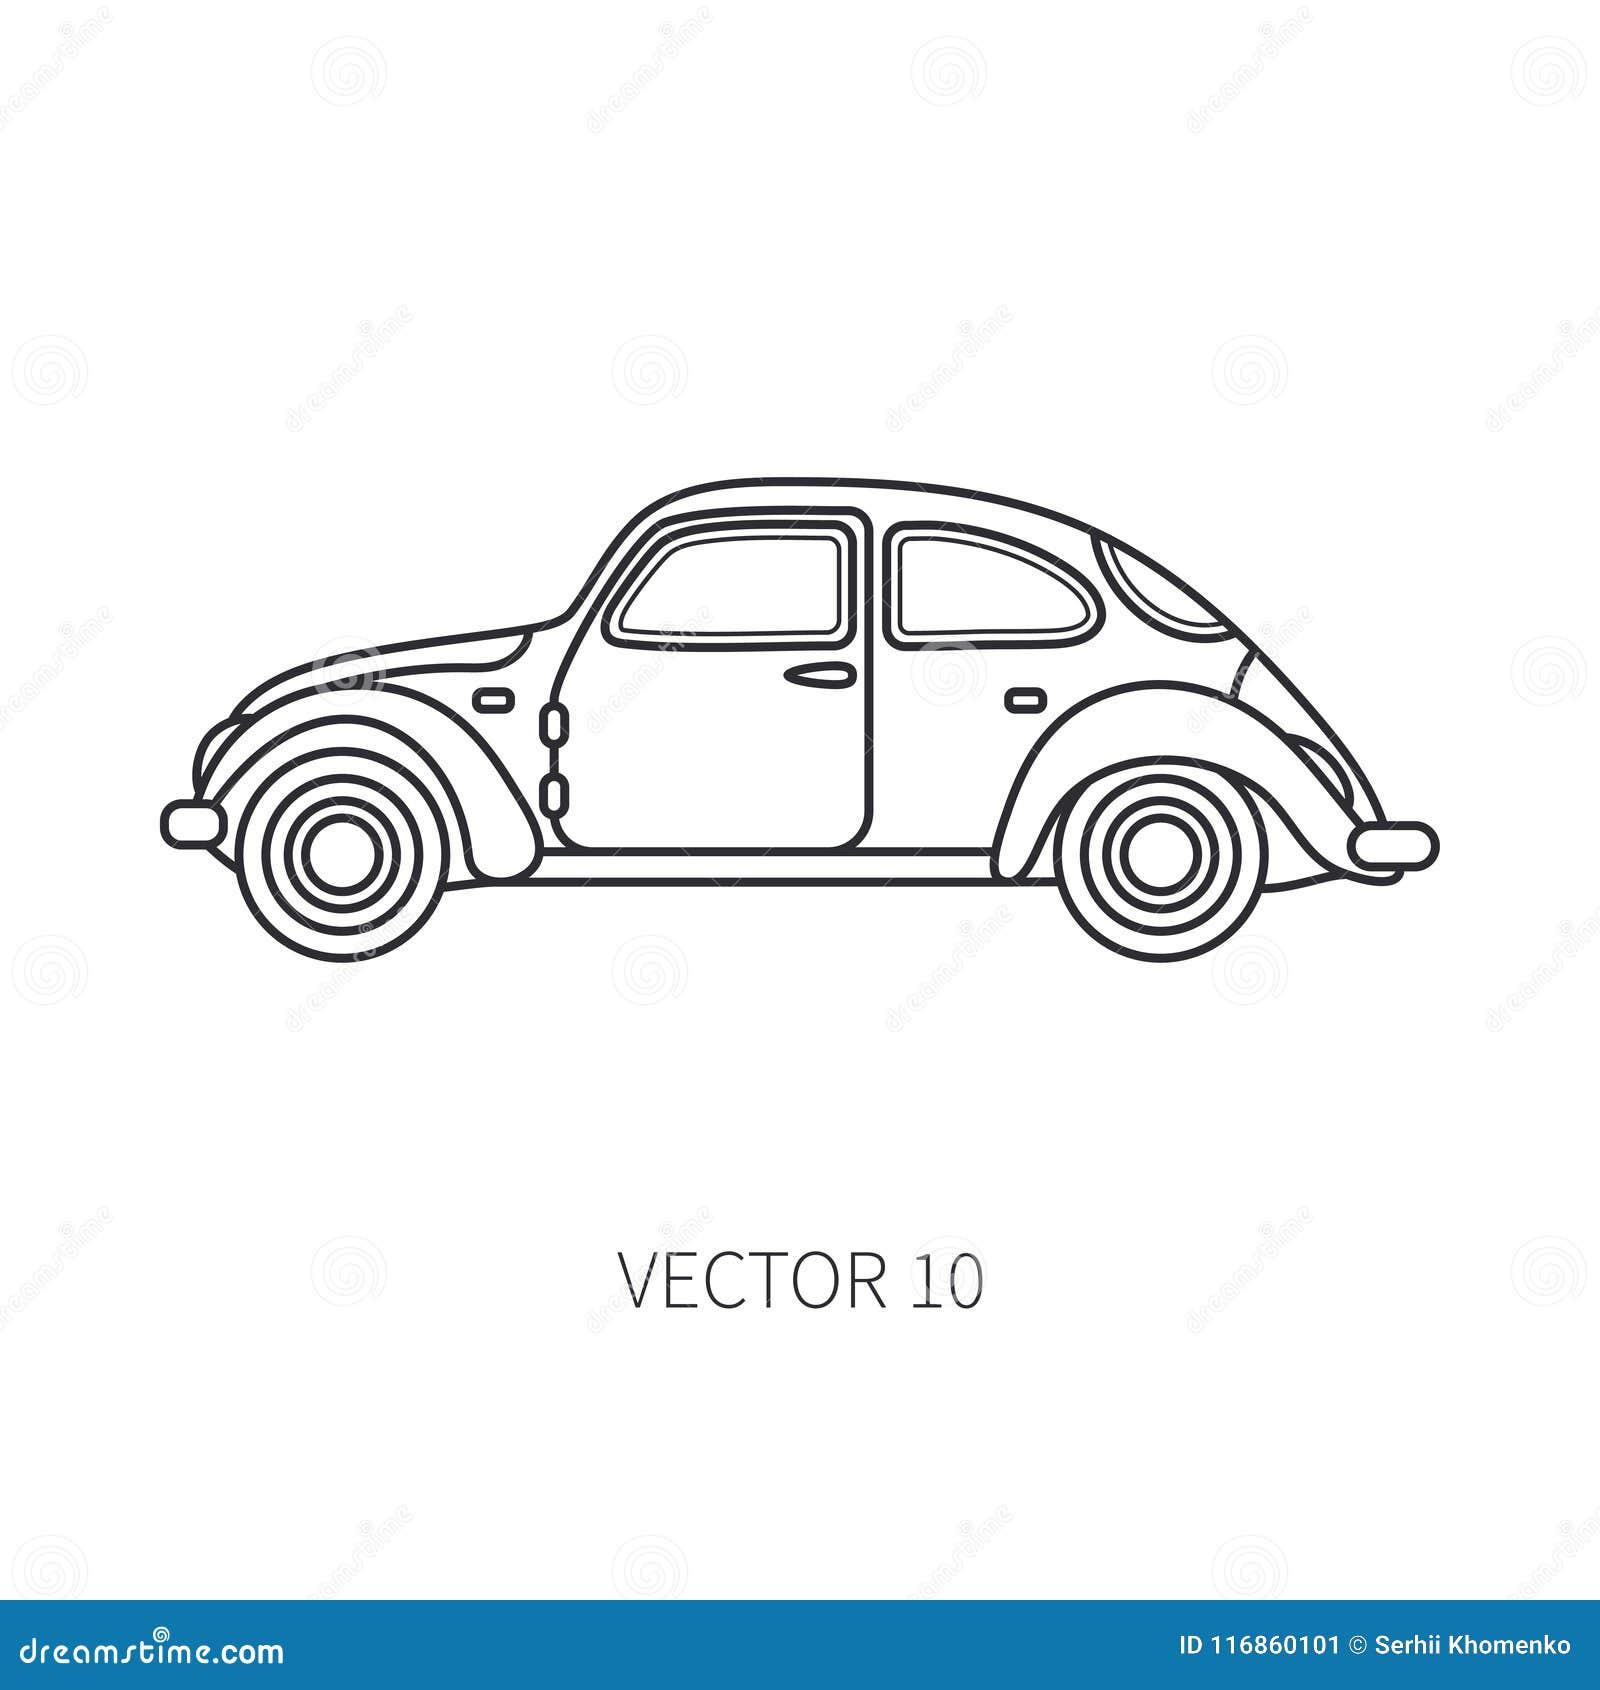 Line vector icon retro tourism auto. Classic 1950s style. Nostalgia subcompact antique automobile. Summer travel